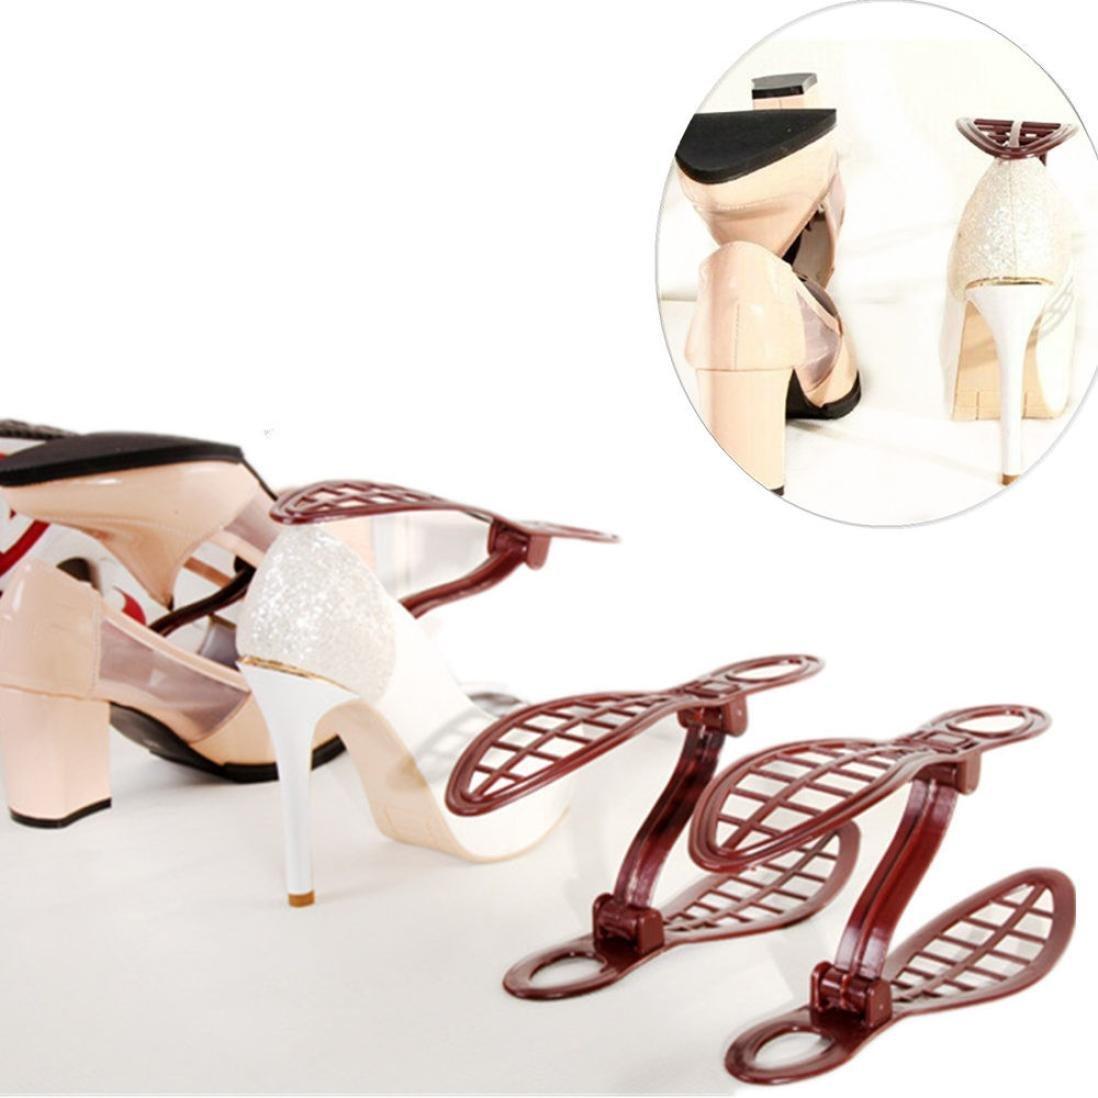 Amiley Hot sale 1 pc Plastic Shoe Organizer Space Saving Storage Shoes Rack Durable Shoe Tower Shelf Set (Random)